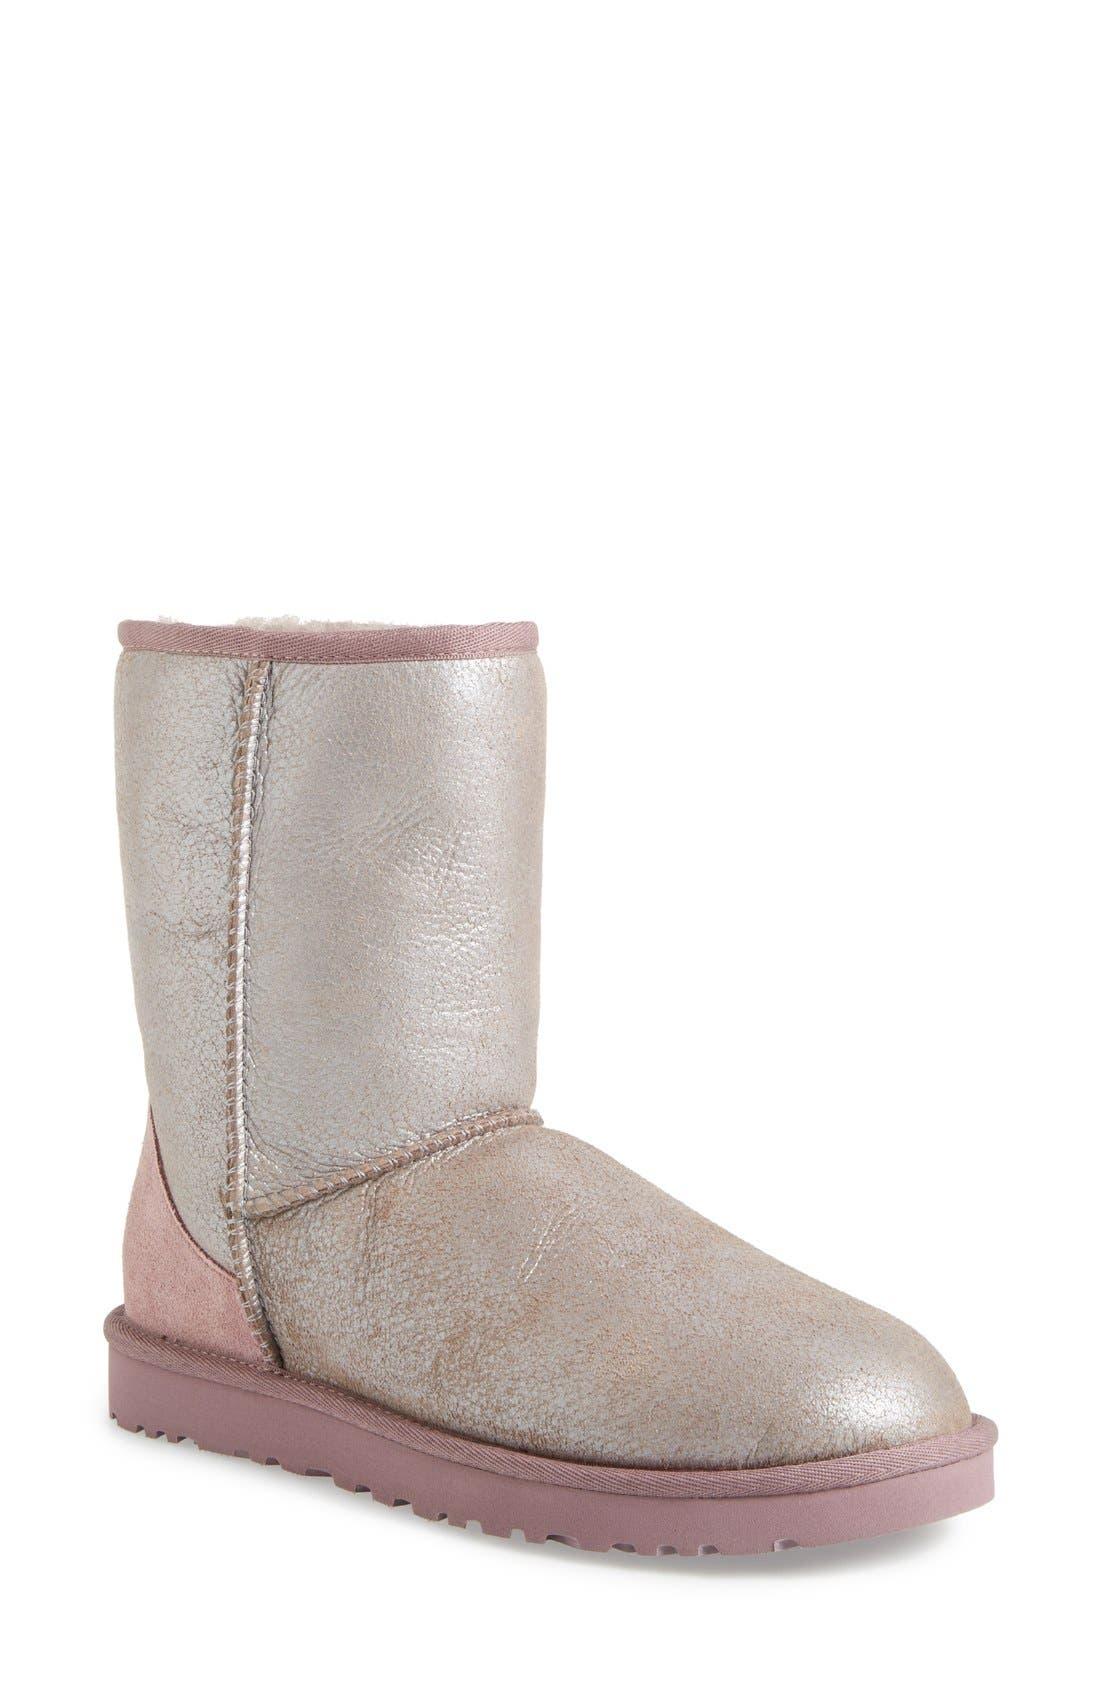 Alternate Image 1 Selected - UGG® 'Classic Short - Metallic' Boot (Women)